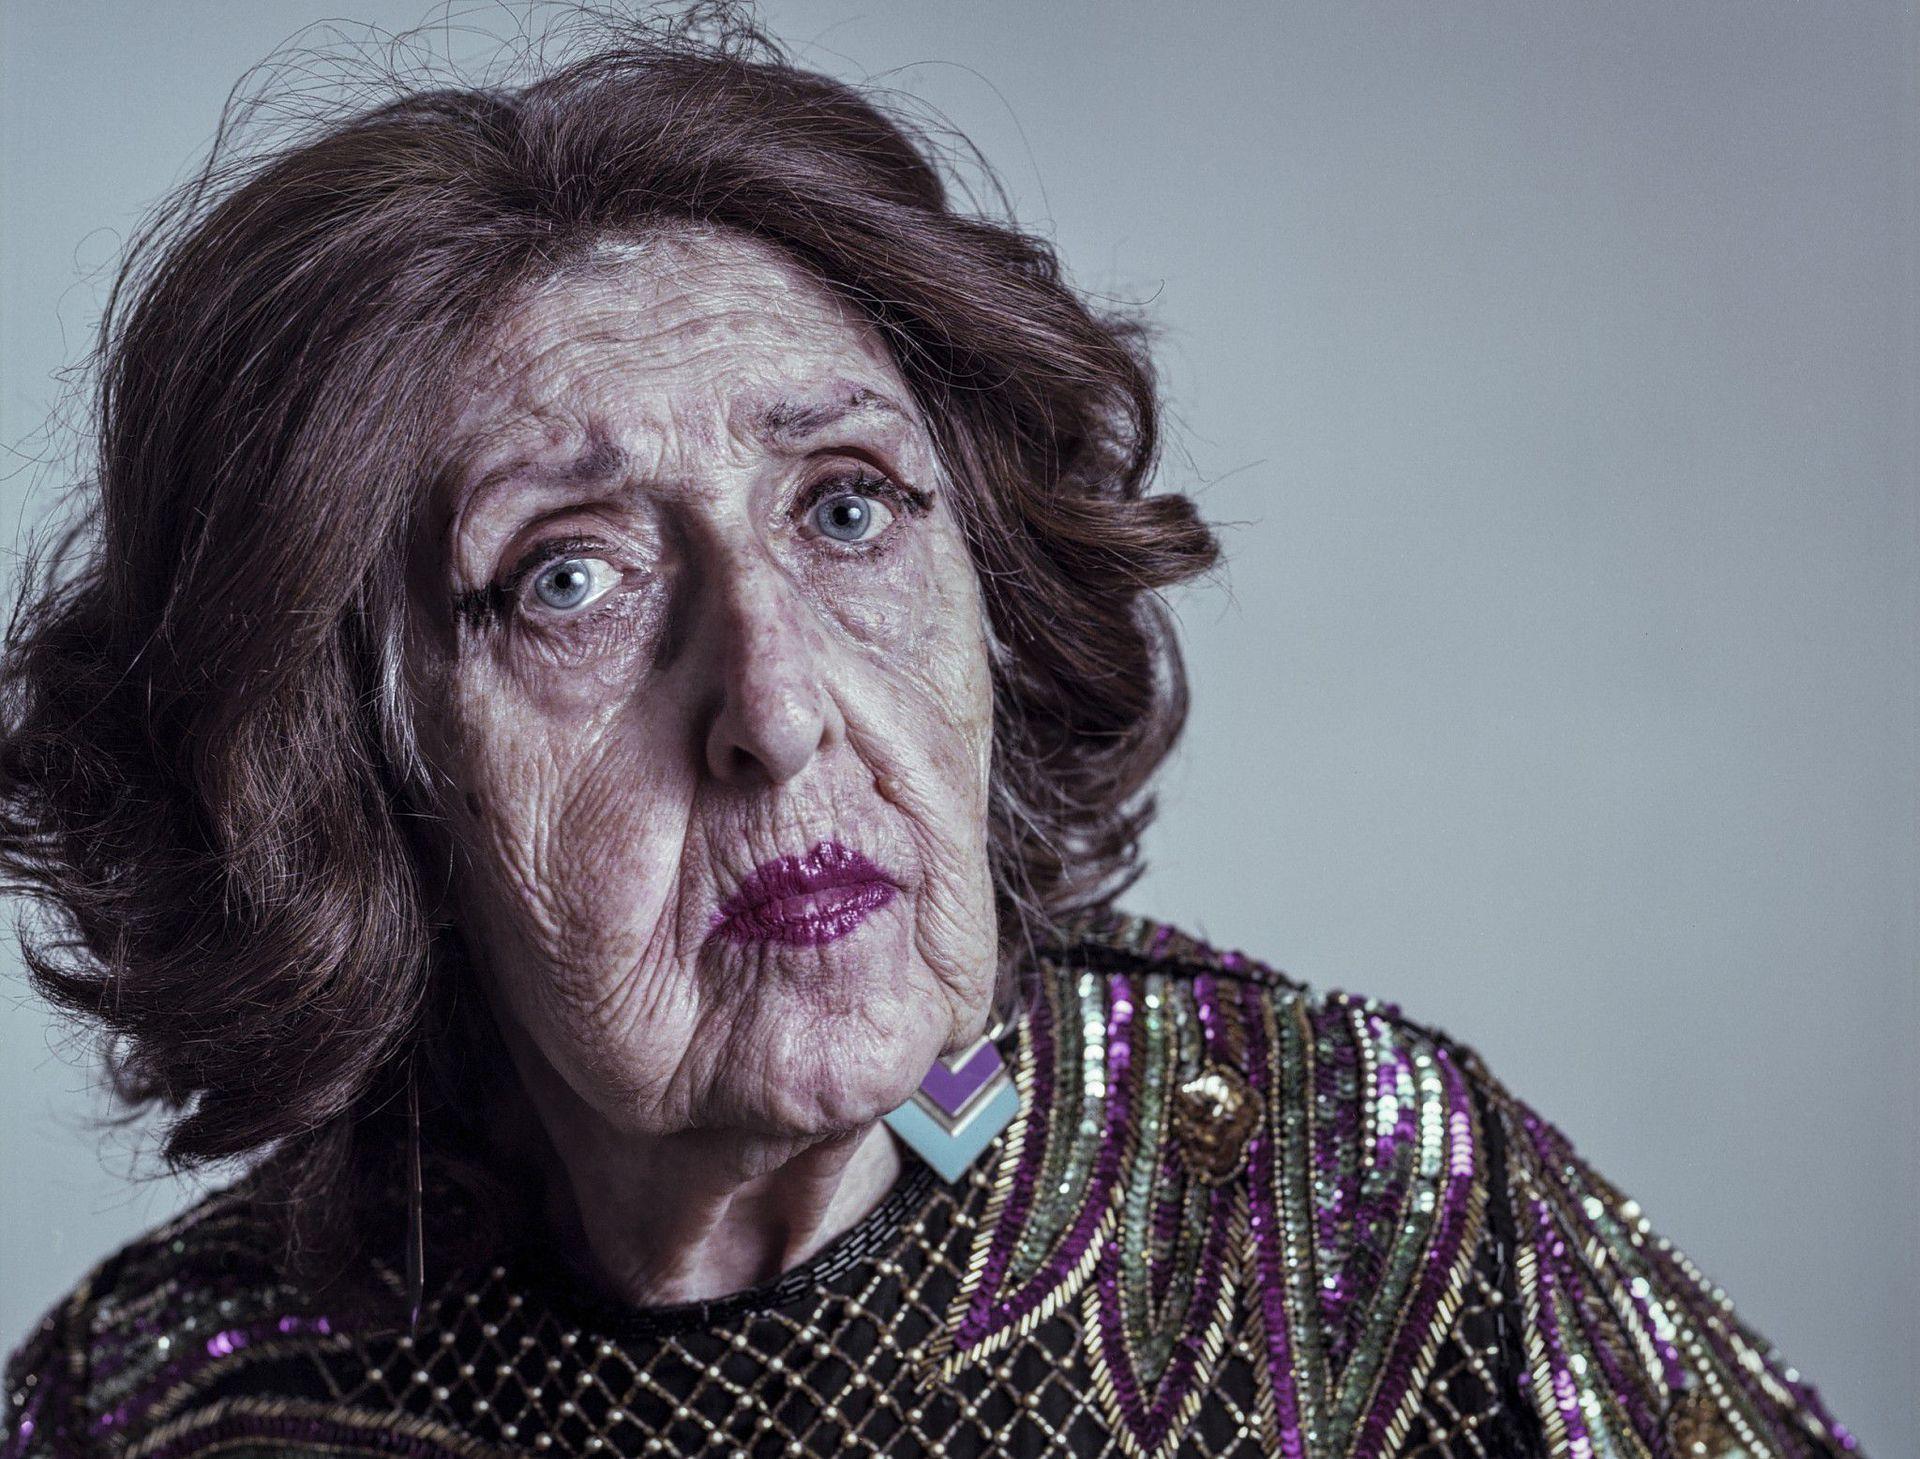 Amazing portraits of Ida Haendel, 89